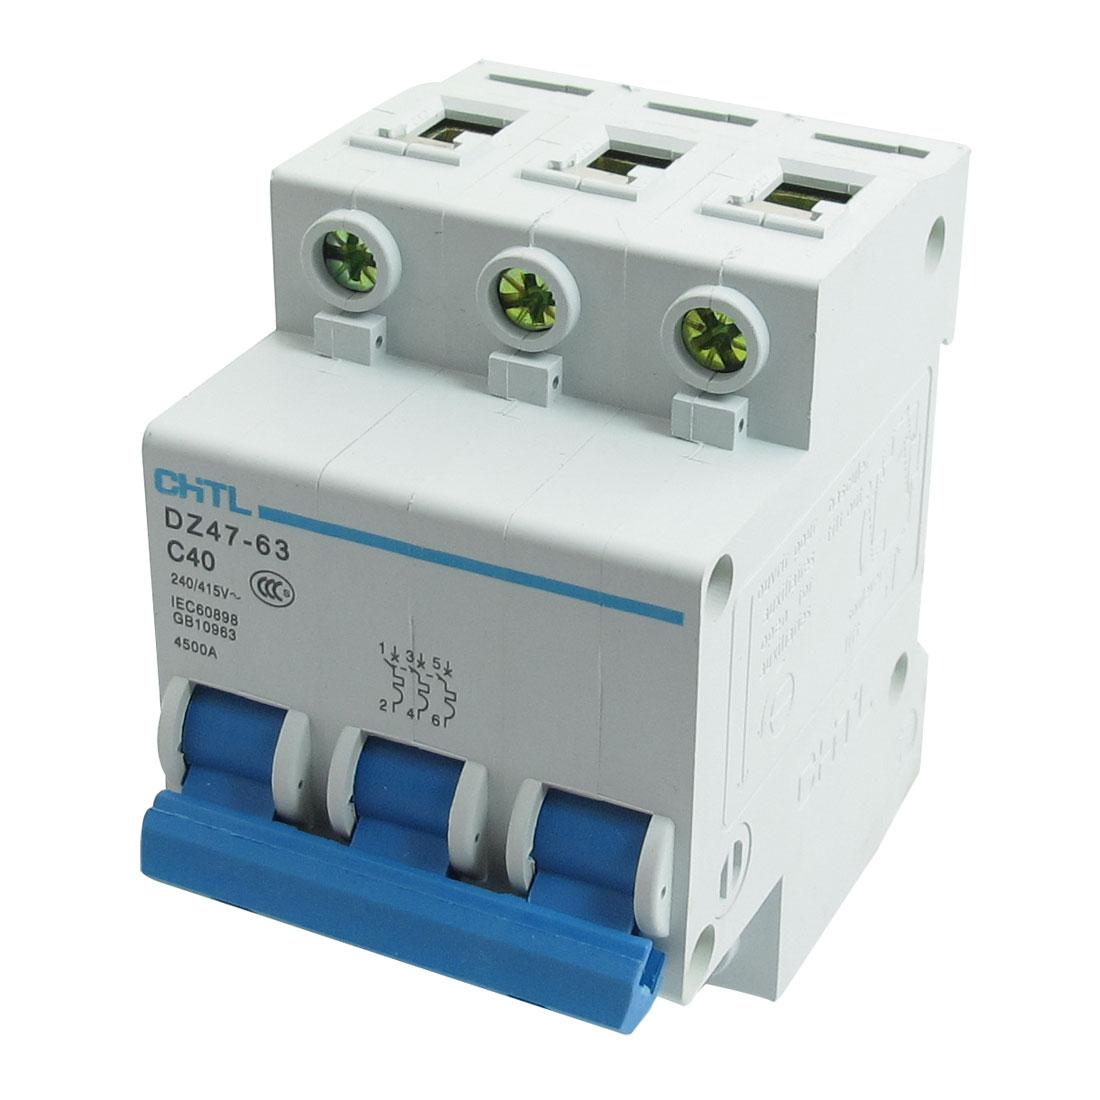 DZ47-63 C40 40A 240/415VAC 4500A Breaking Capacity 3 Poles Circuit Breaker